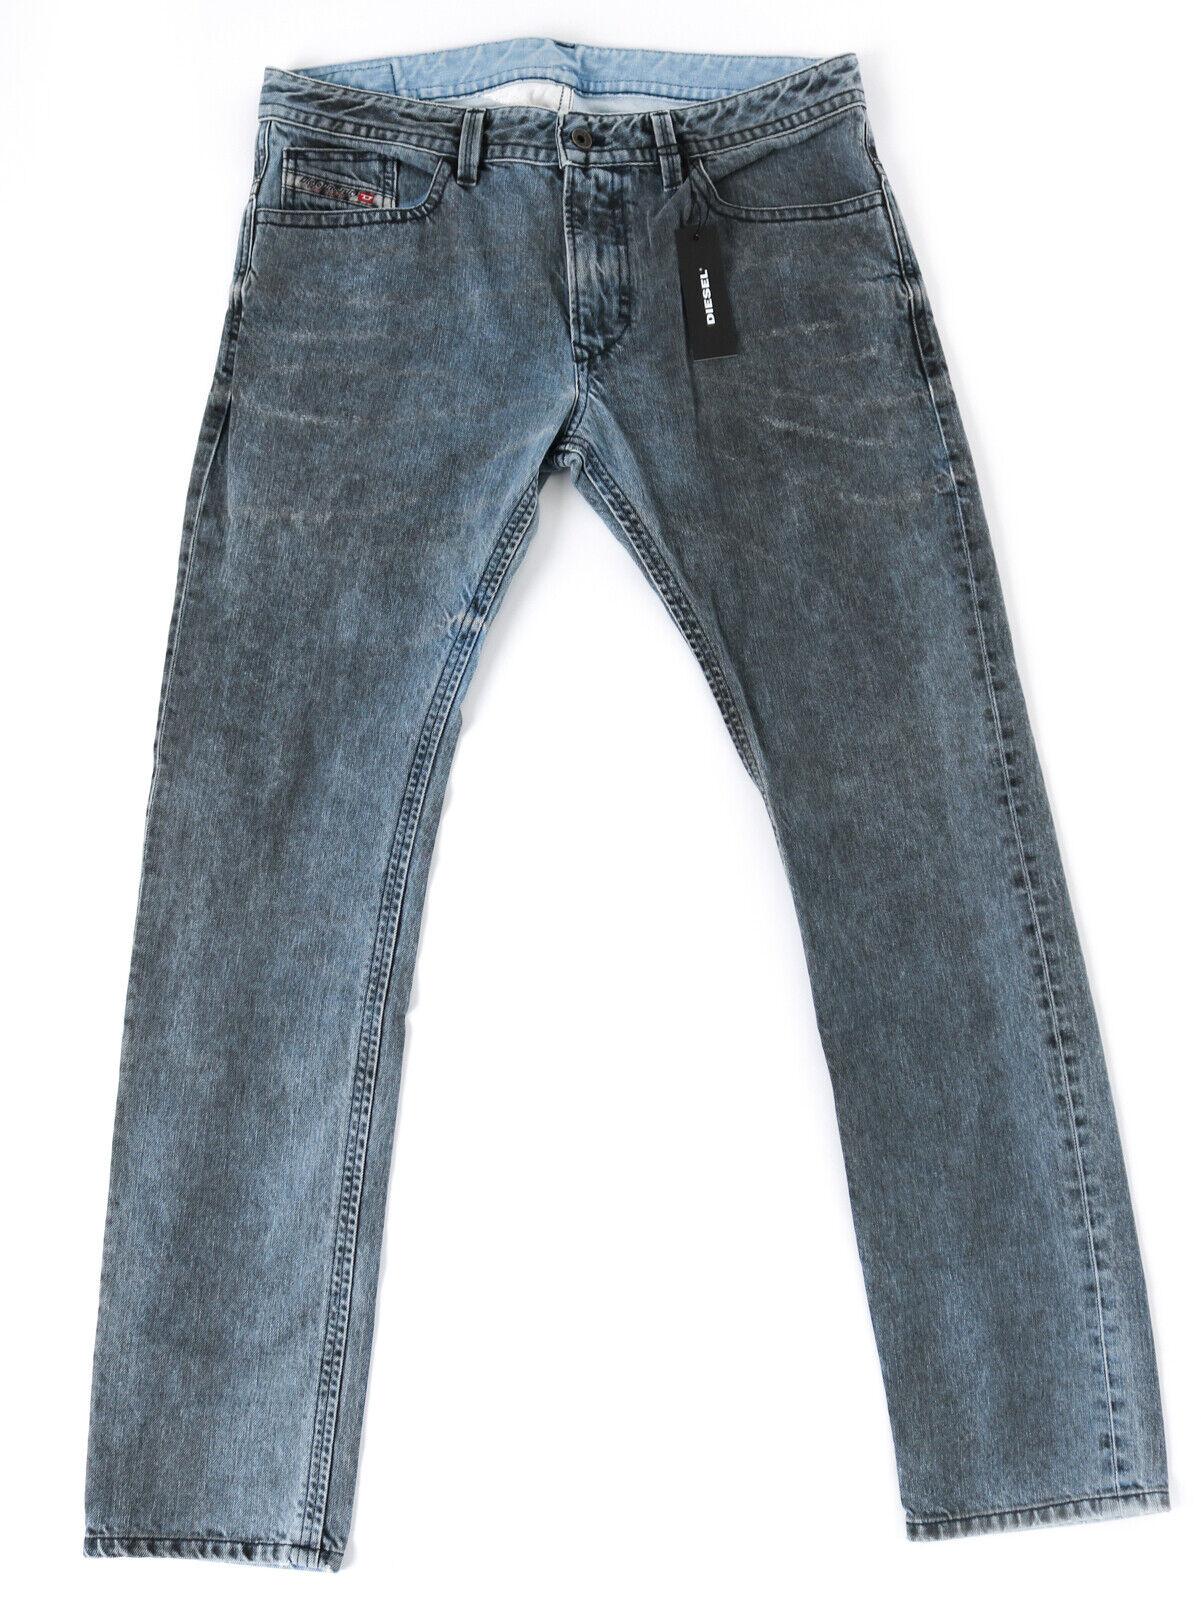 Diesel Herren Slim Fit Jeans Hose   THAVAR 008XP   Prototyp  *RAR*  W33 L32